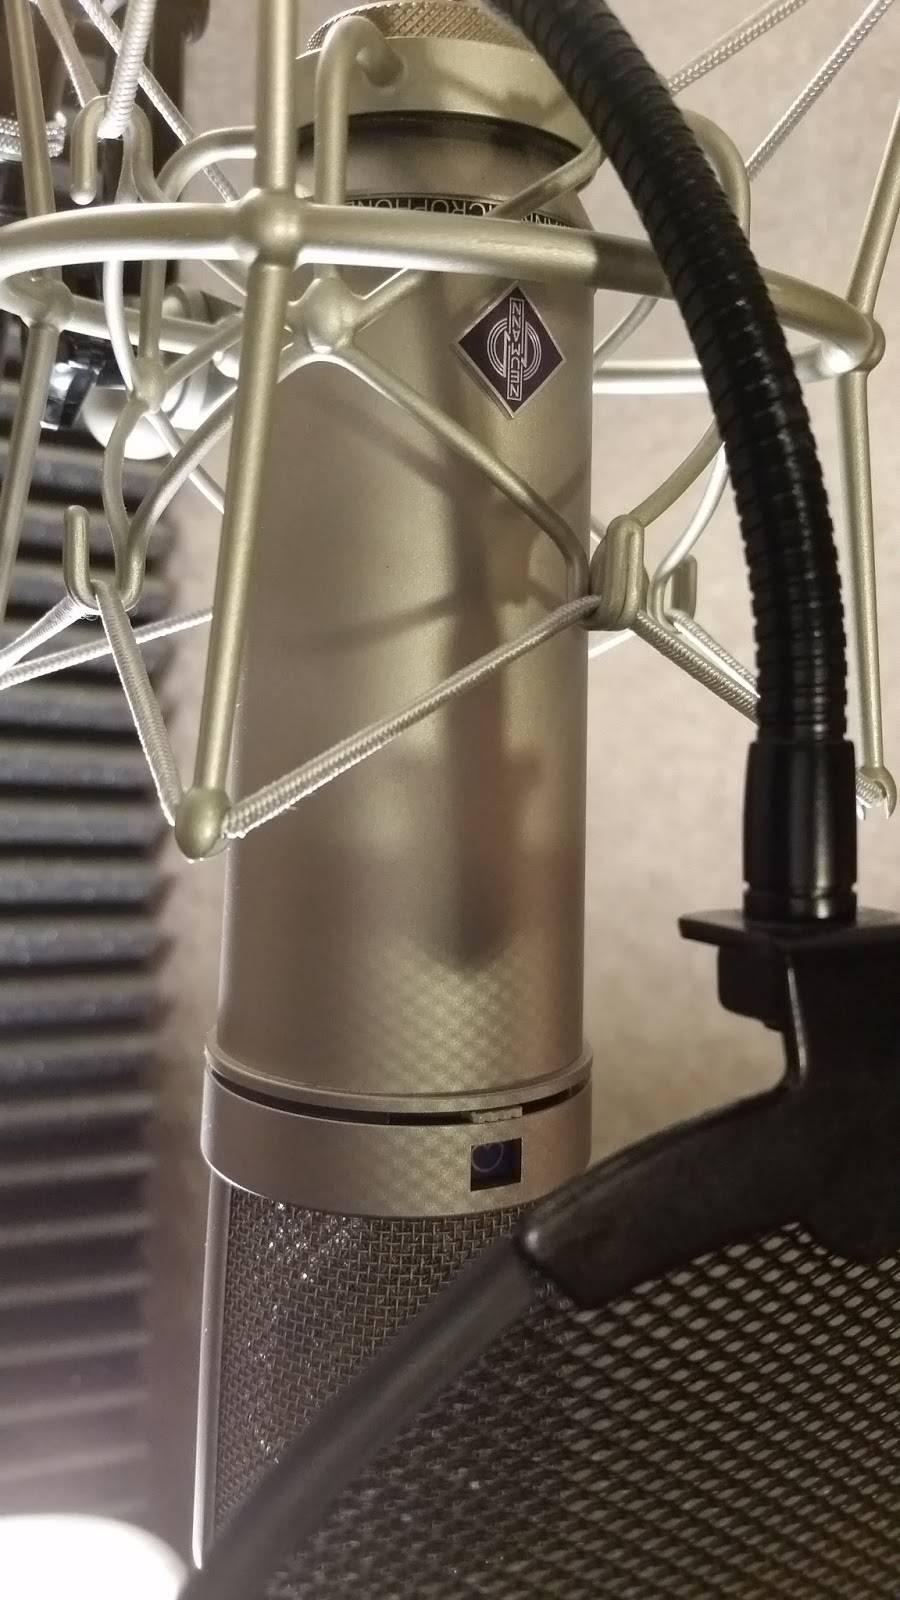 Anthem Recording Studio - electronics store  | Photo 7 of 10 | Address: Plano, TX 75074, USA | Phone: (972) 836-8939